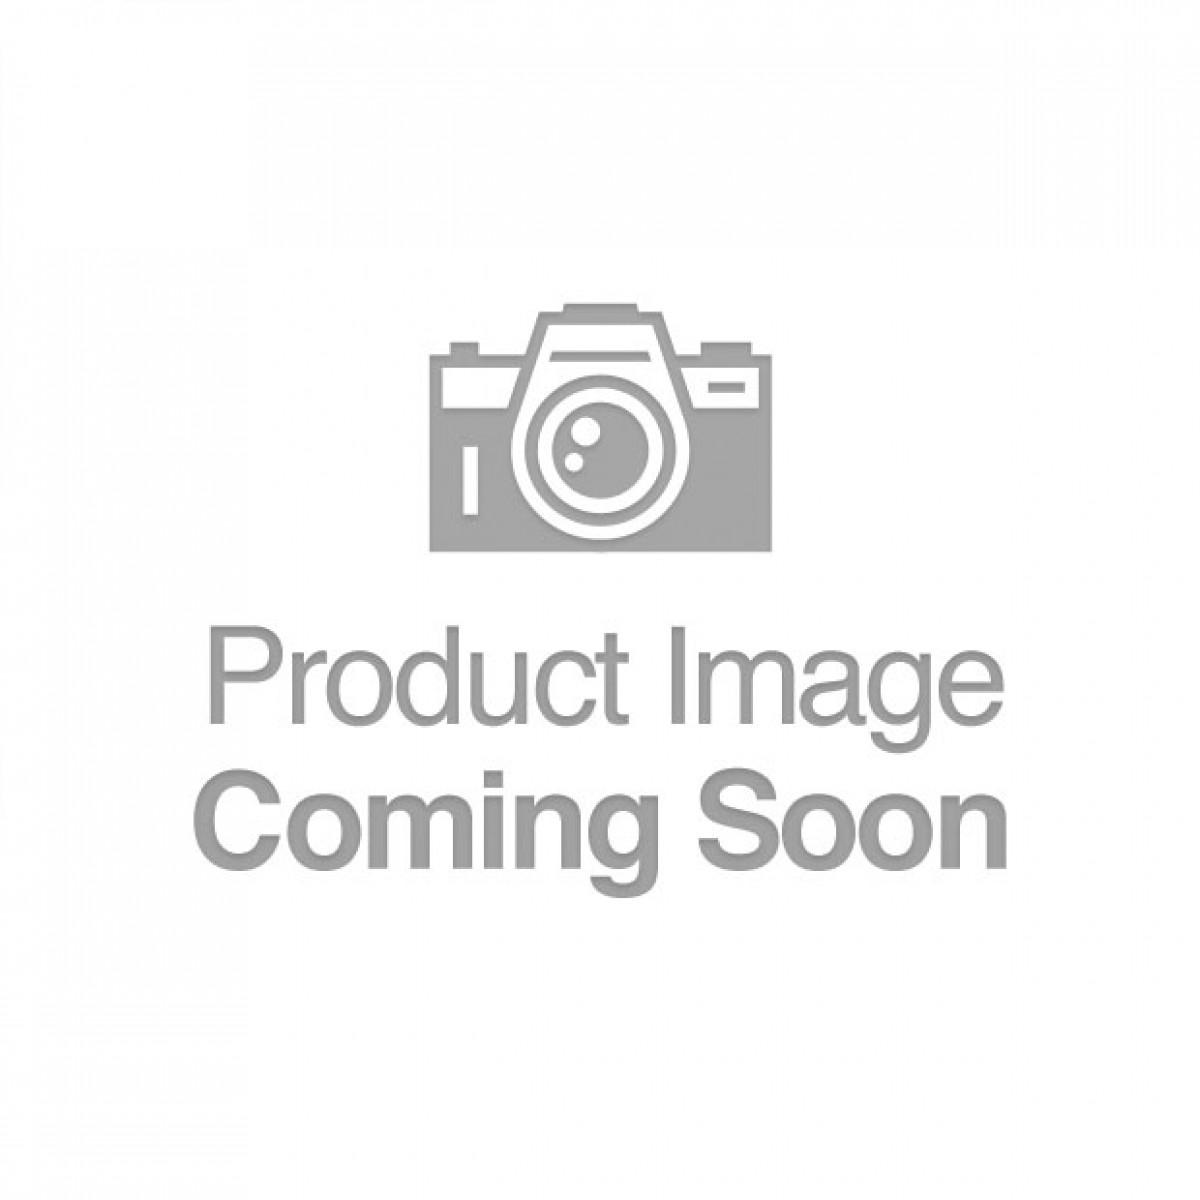 We-Vibe Chorus / Womanizer Premium Golden Moments Collection - Black/Gold